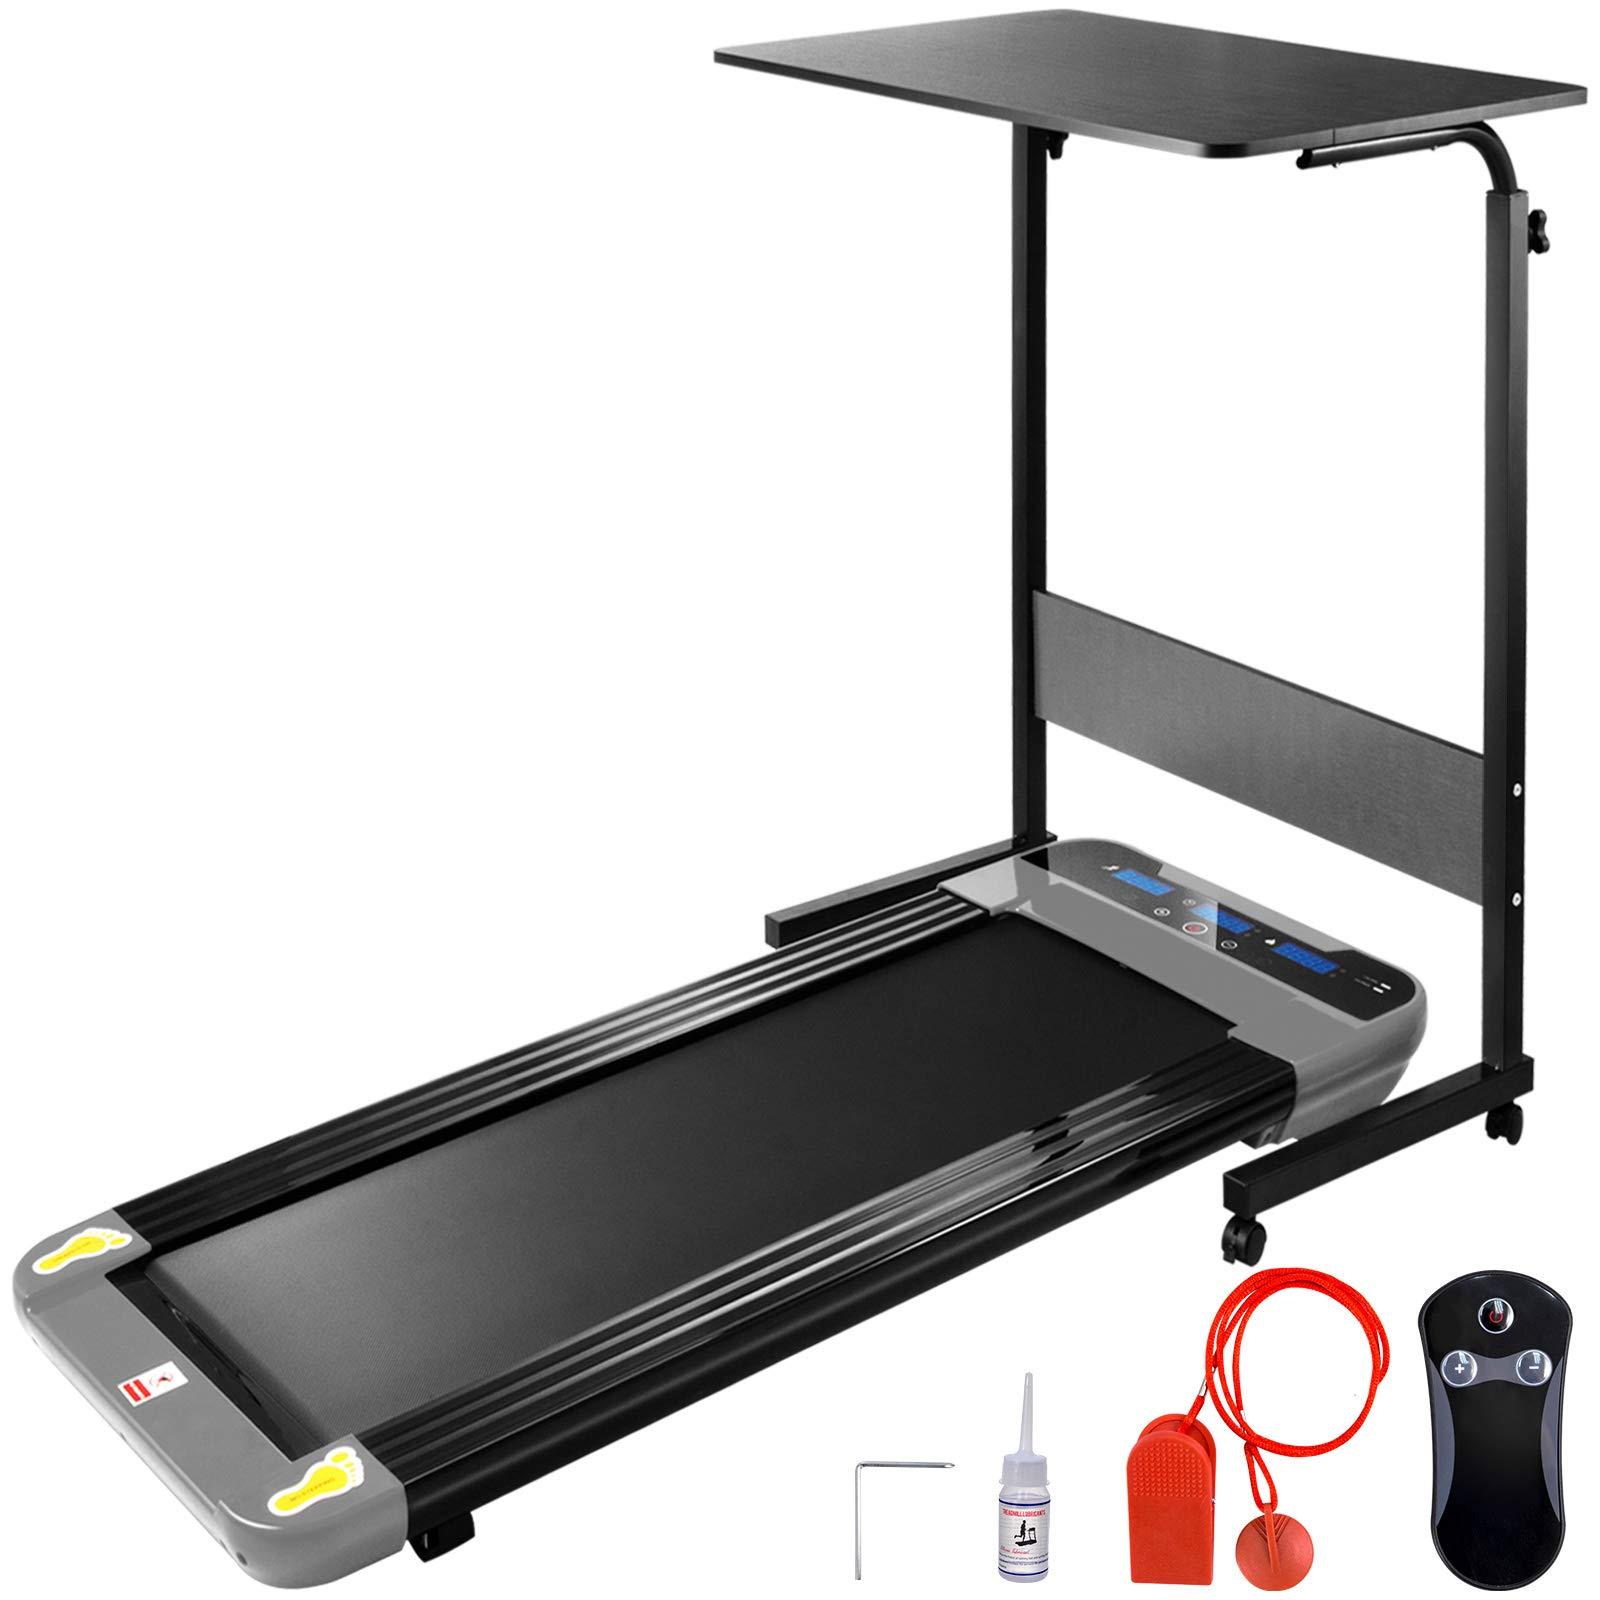 Popsport Smart Treadmill Digital Portable Electric Treadmill Under Desk Treadmill Slim Fitness Home Office(Silver with Desk) by Popsport